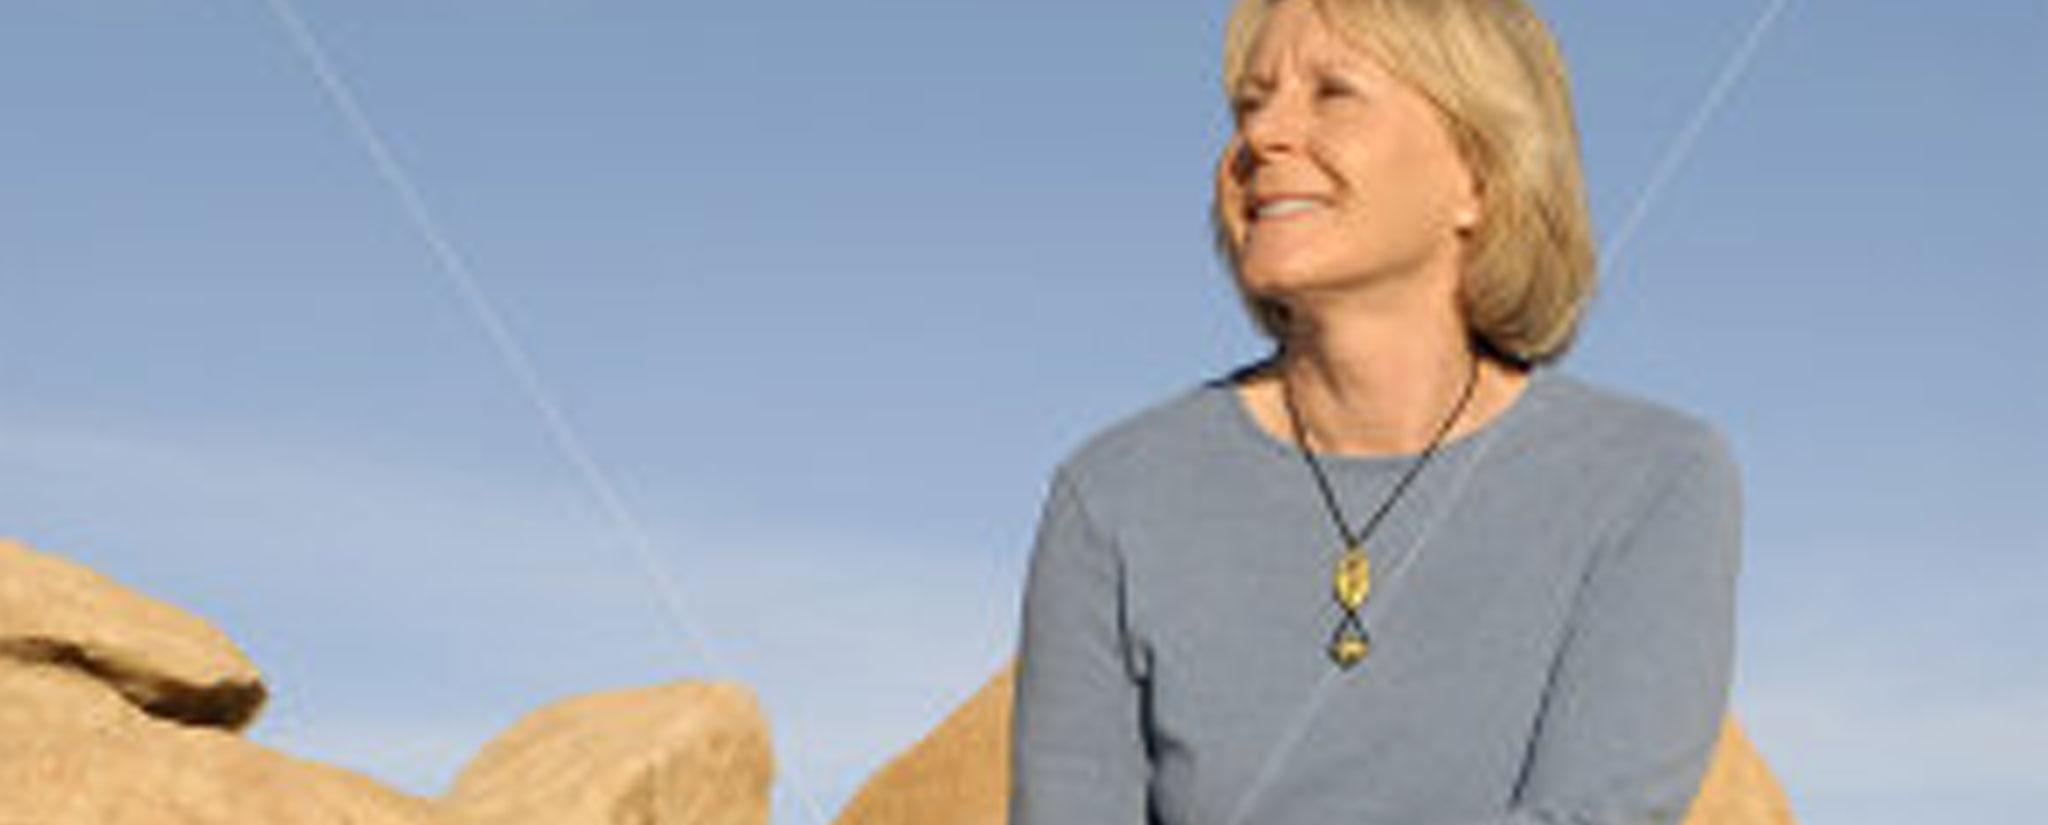 psychonephrology-kidney-nephrology-mindfulness